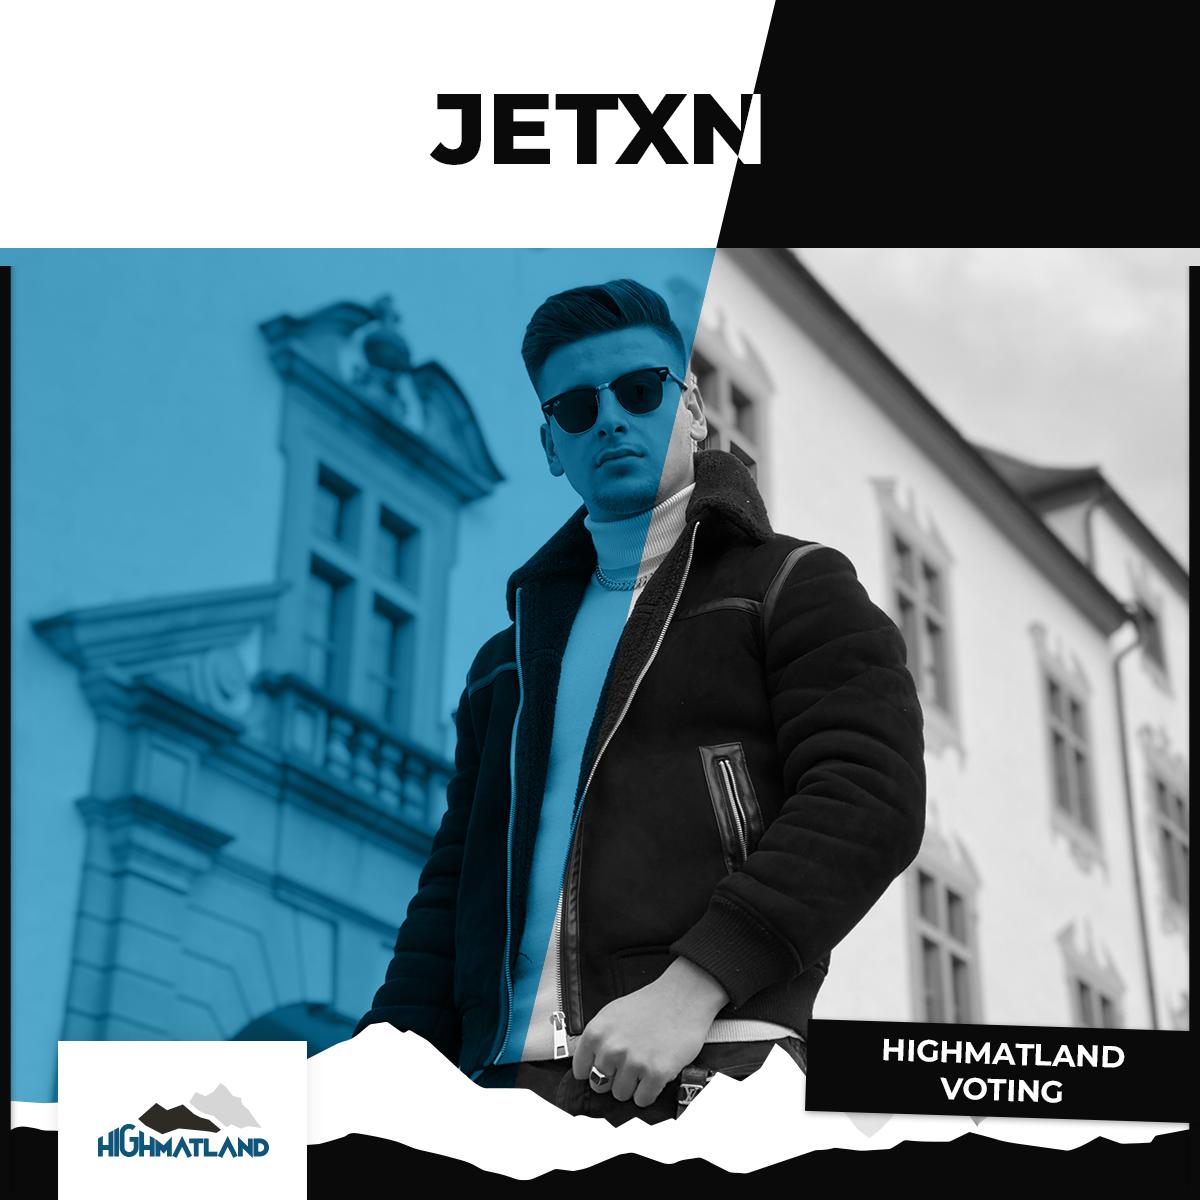 Jetxn Highmatland